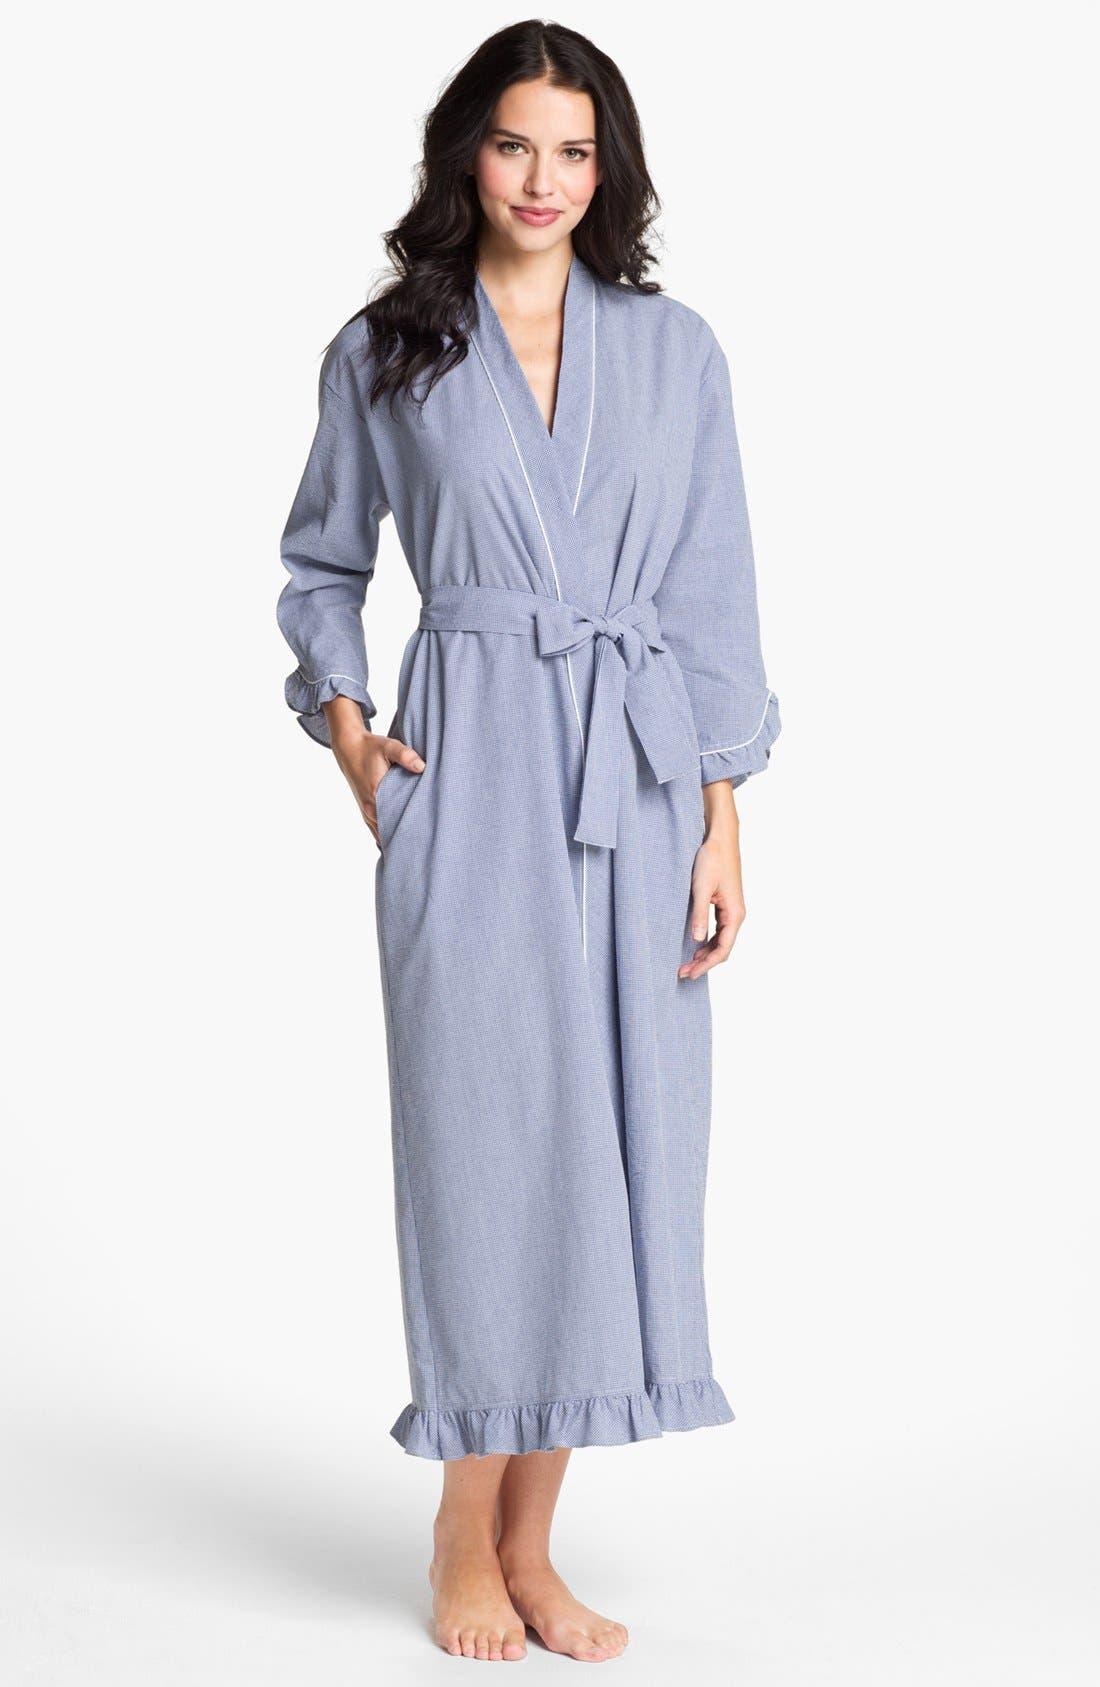 Alternate Image 1 Selected - Eileen West 'Starfish' Ruffled Robe